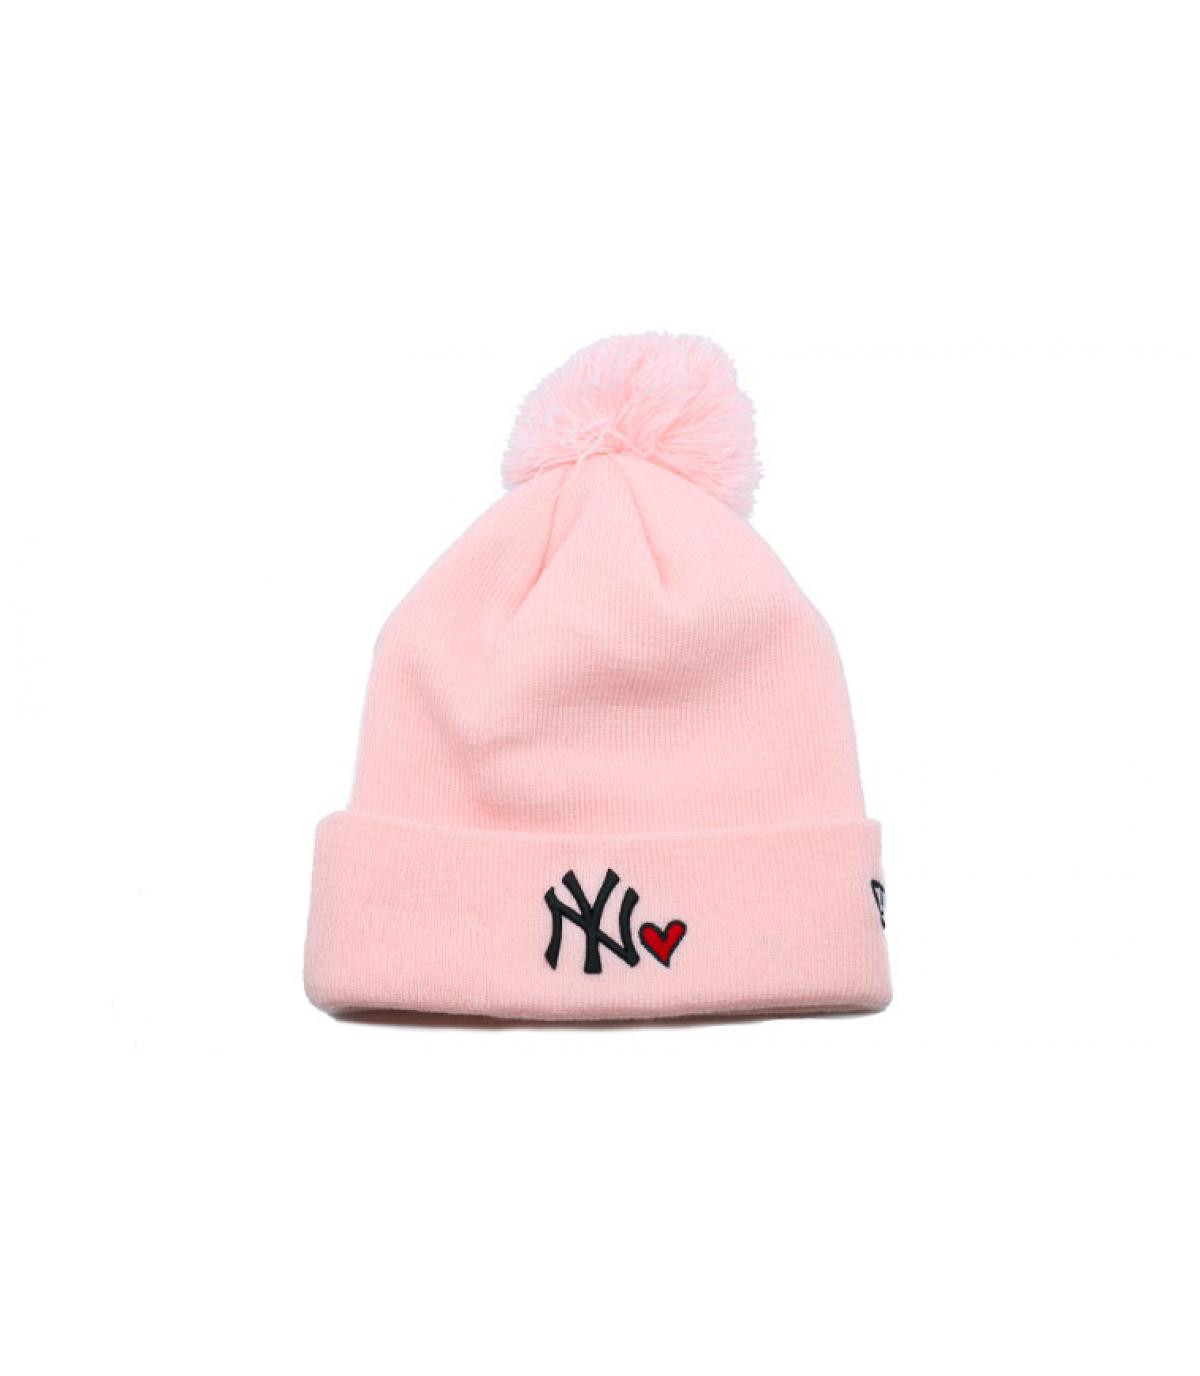 Dettagli Bonnet Wmns Heart NY knit pink - image 2